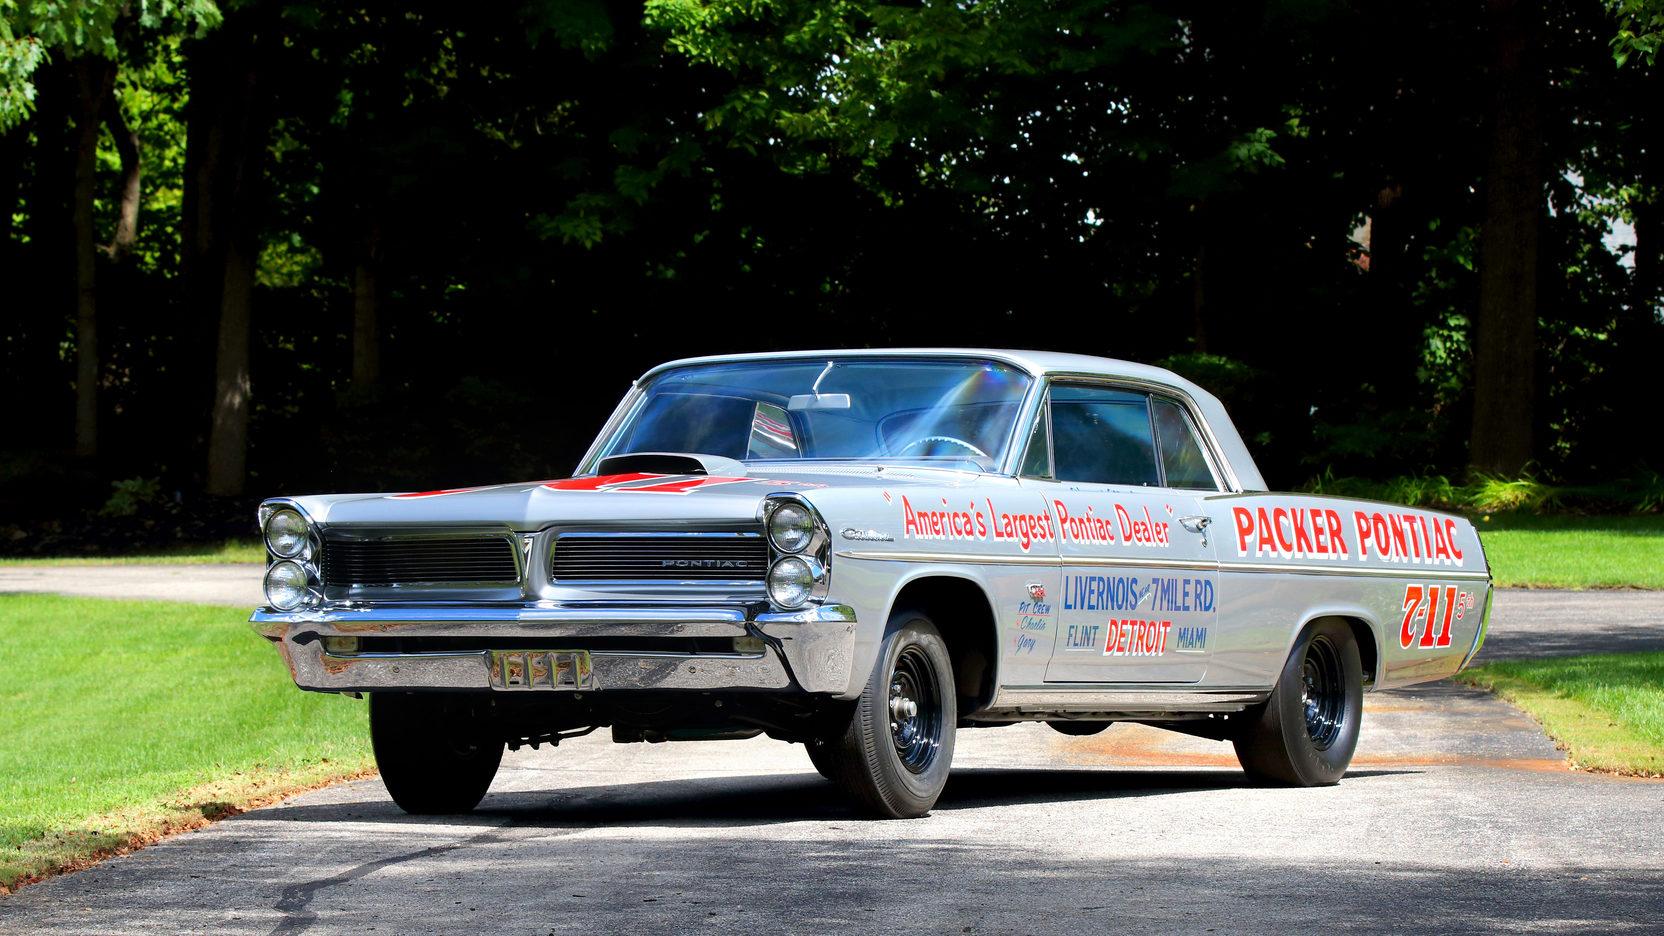 1963 Catalina Super Duty Lightweight Coupe